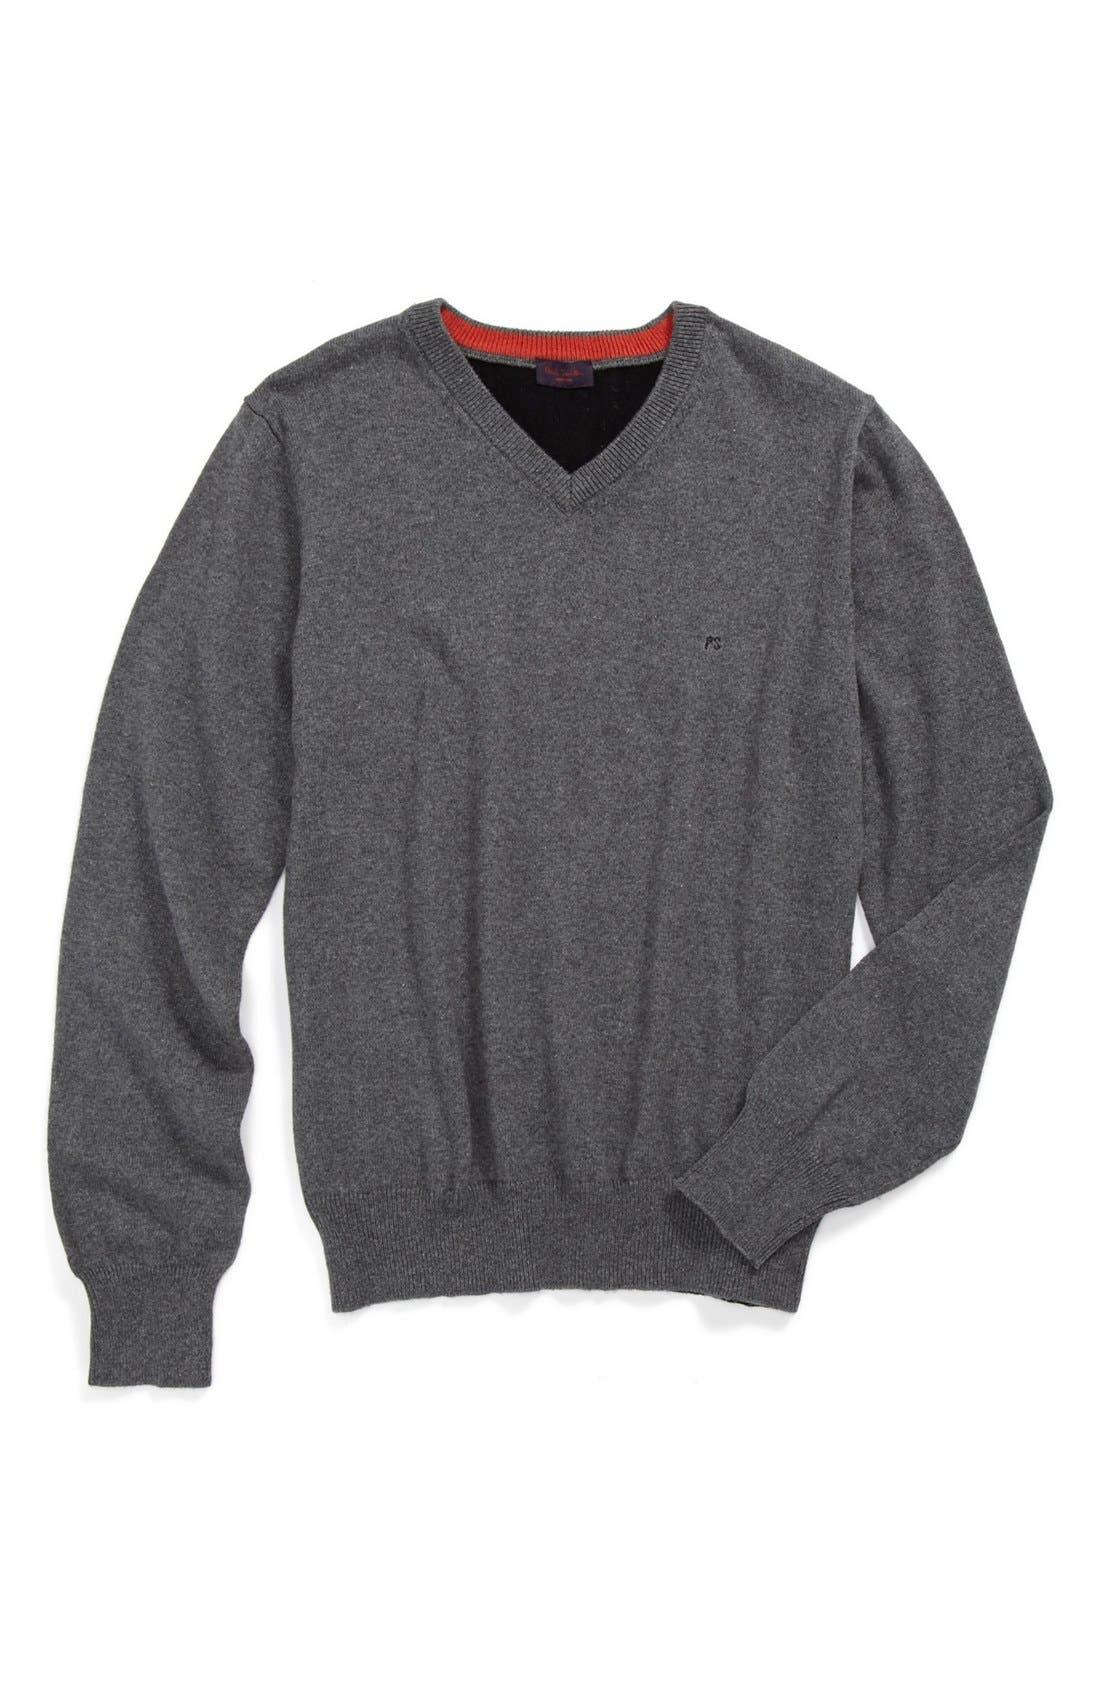 Alternate Image 1 Selected - Paul Smith Junior Sweater (Toddler Boys)